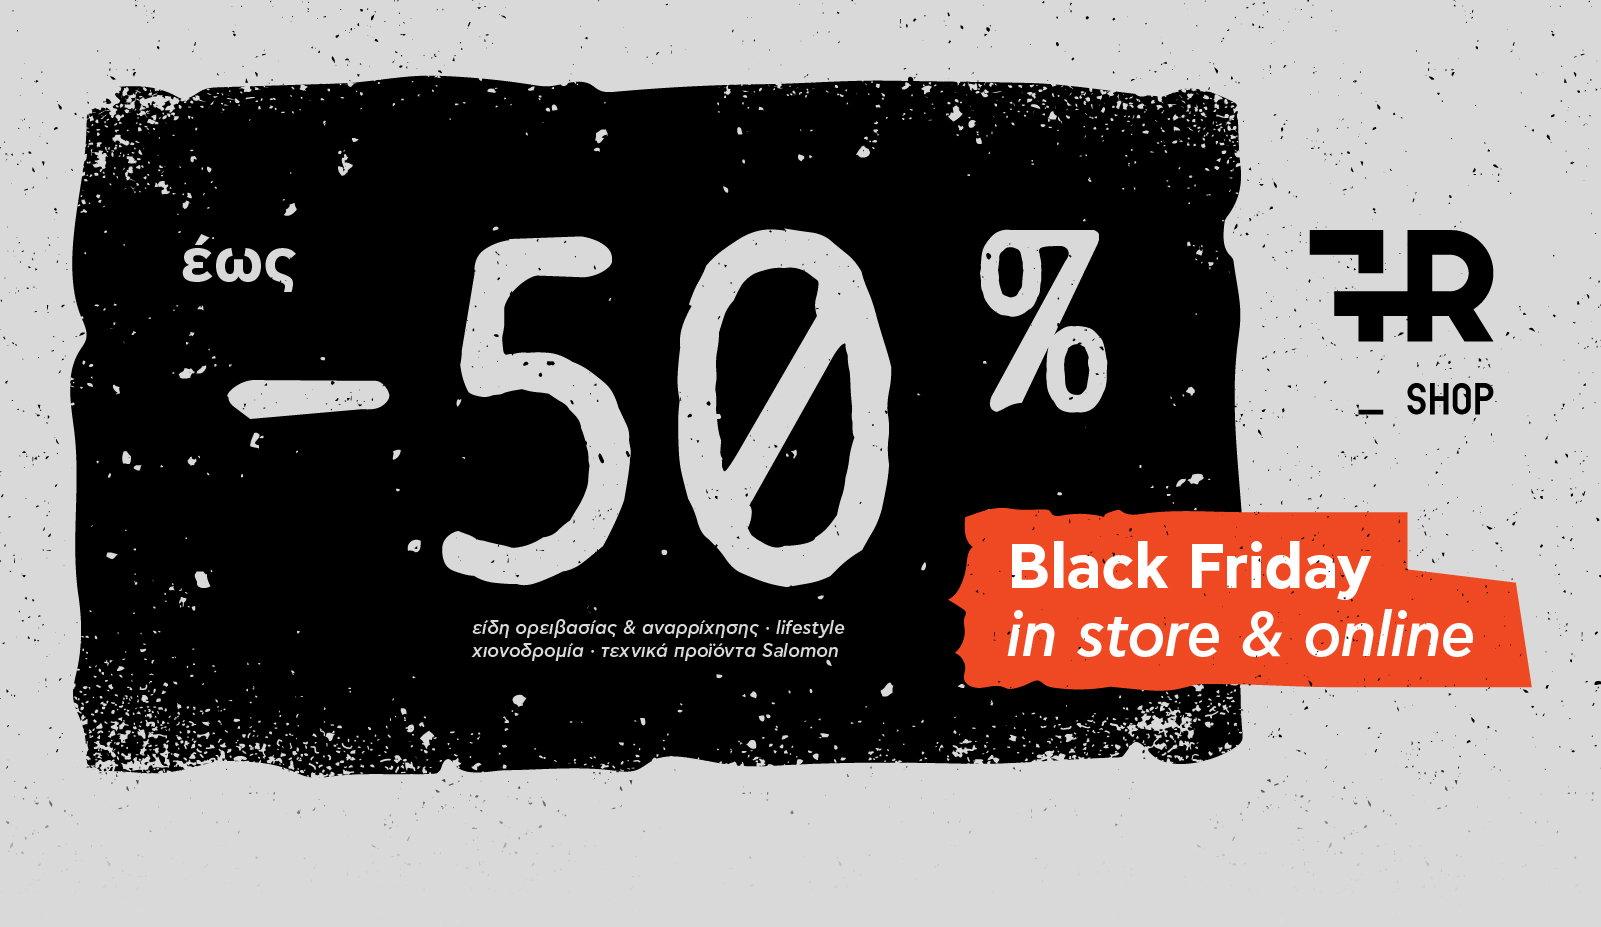 Freeride - Black Friday 2018